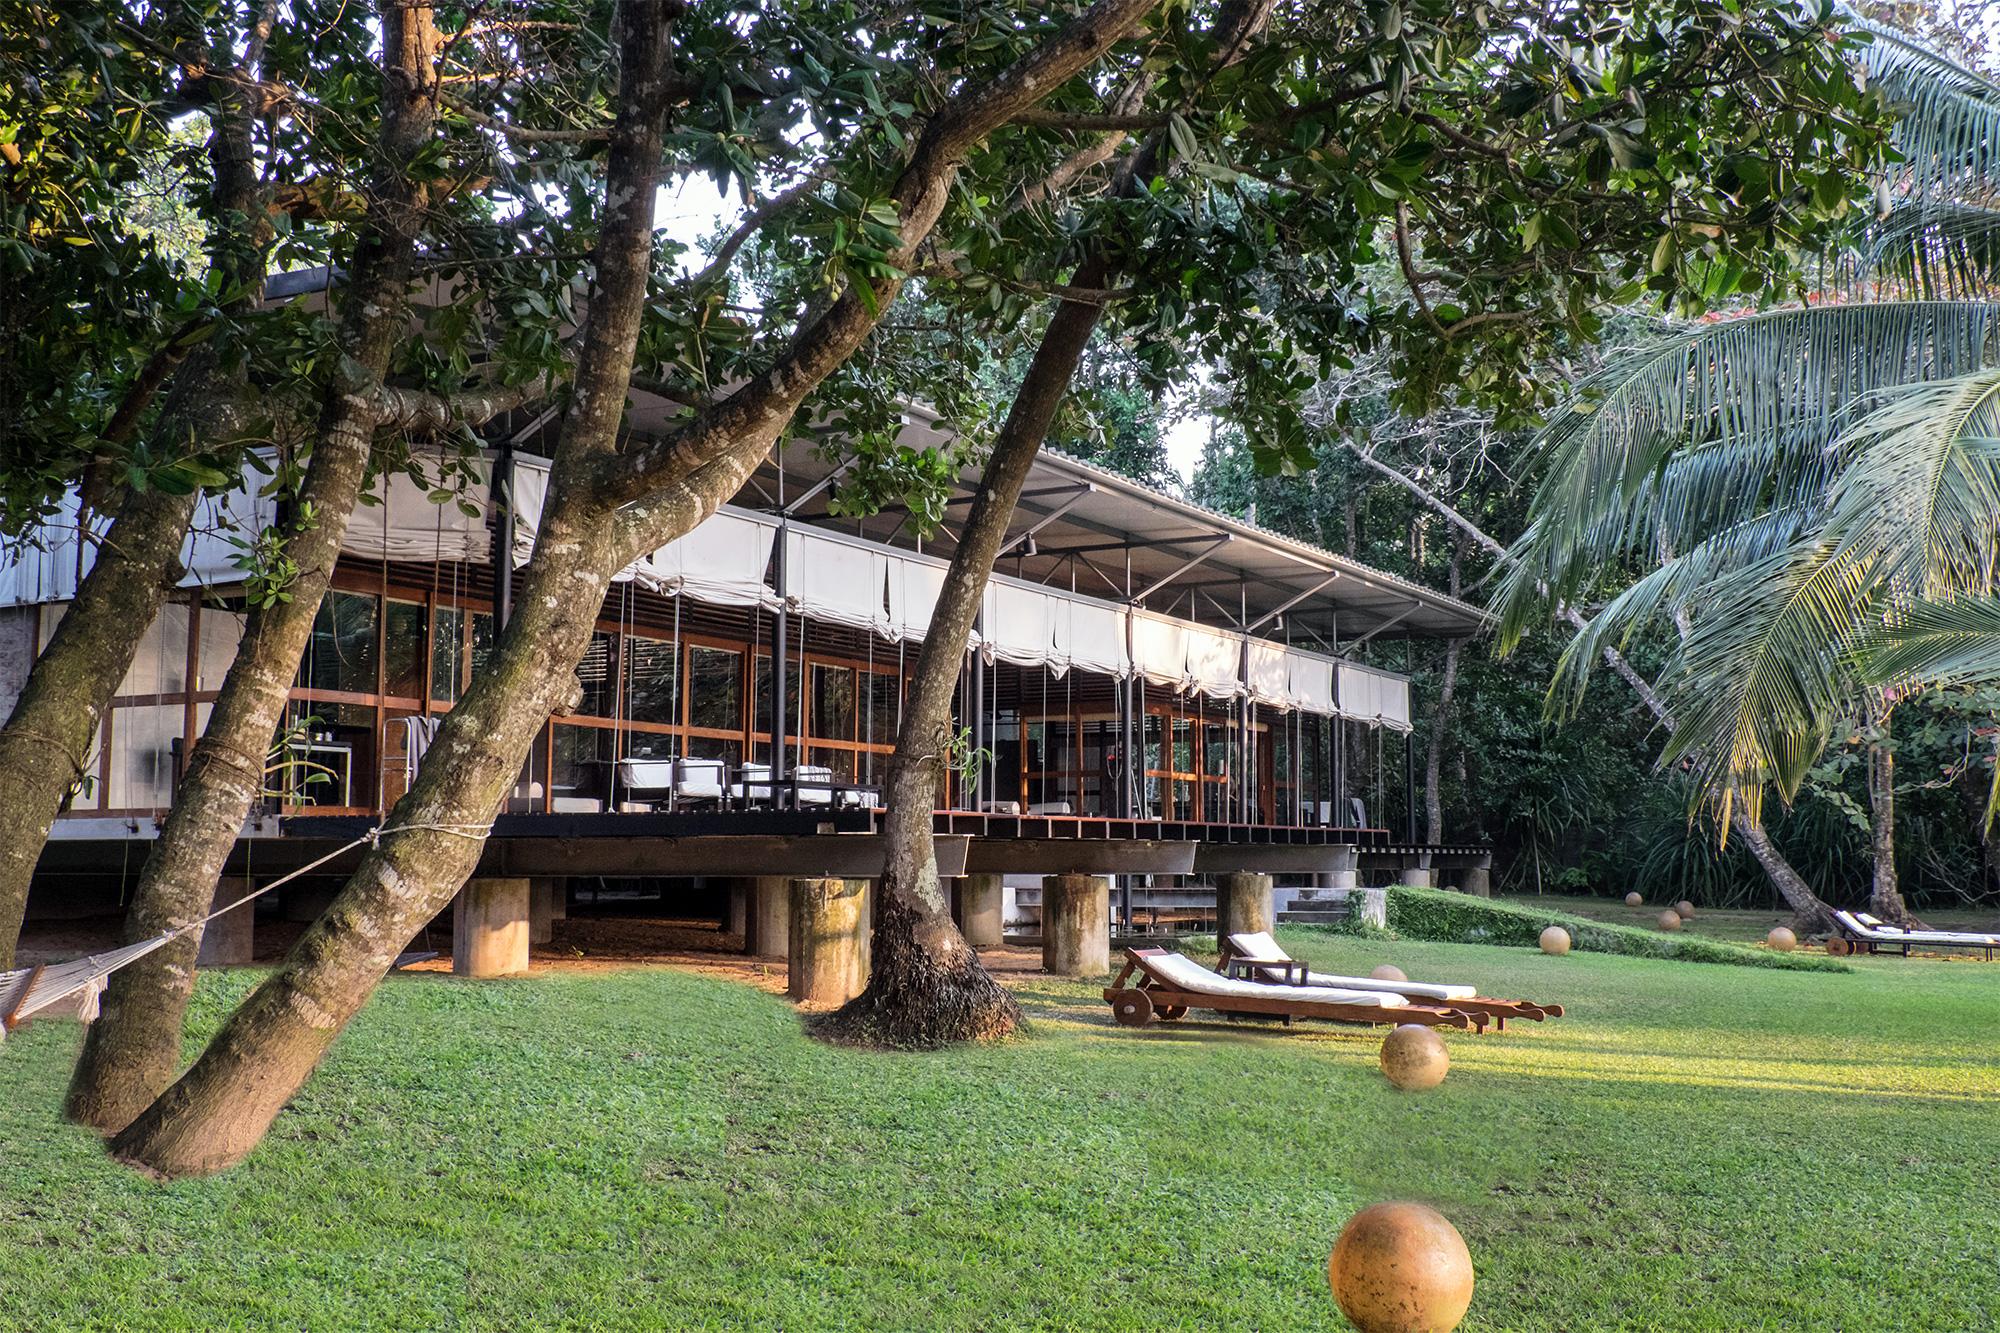 Palmenhain Bungalow im Ayurveda Resort der one world foundation in Ahungalla, Sri Lanka, Foto: Andrea Alessandri